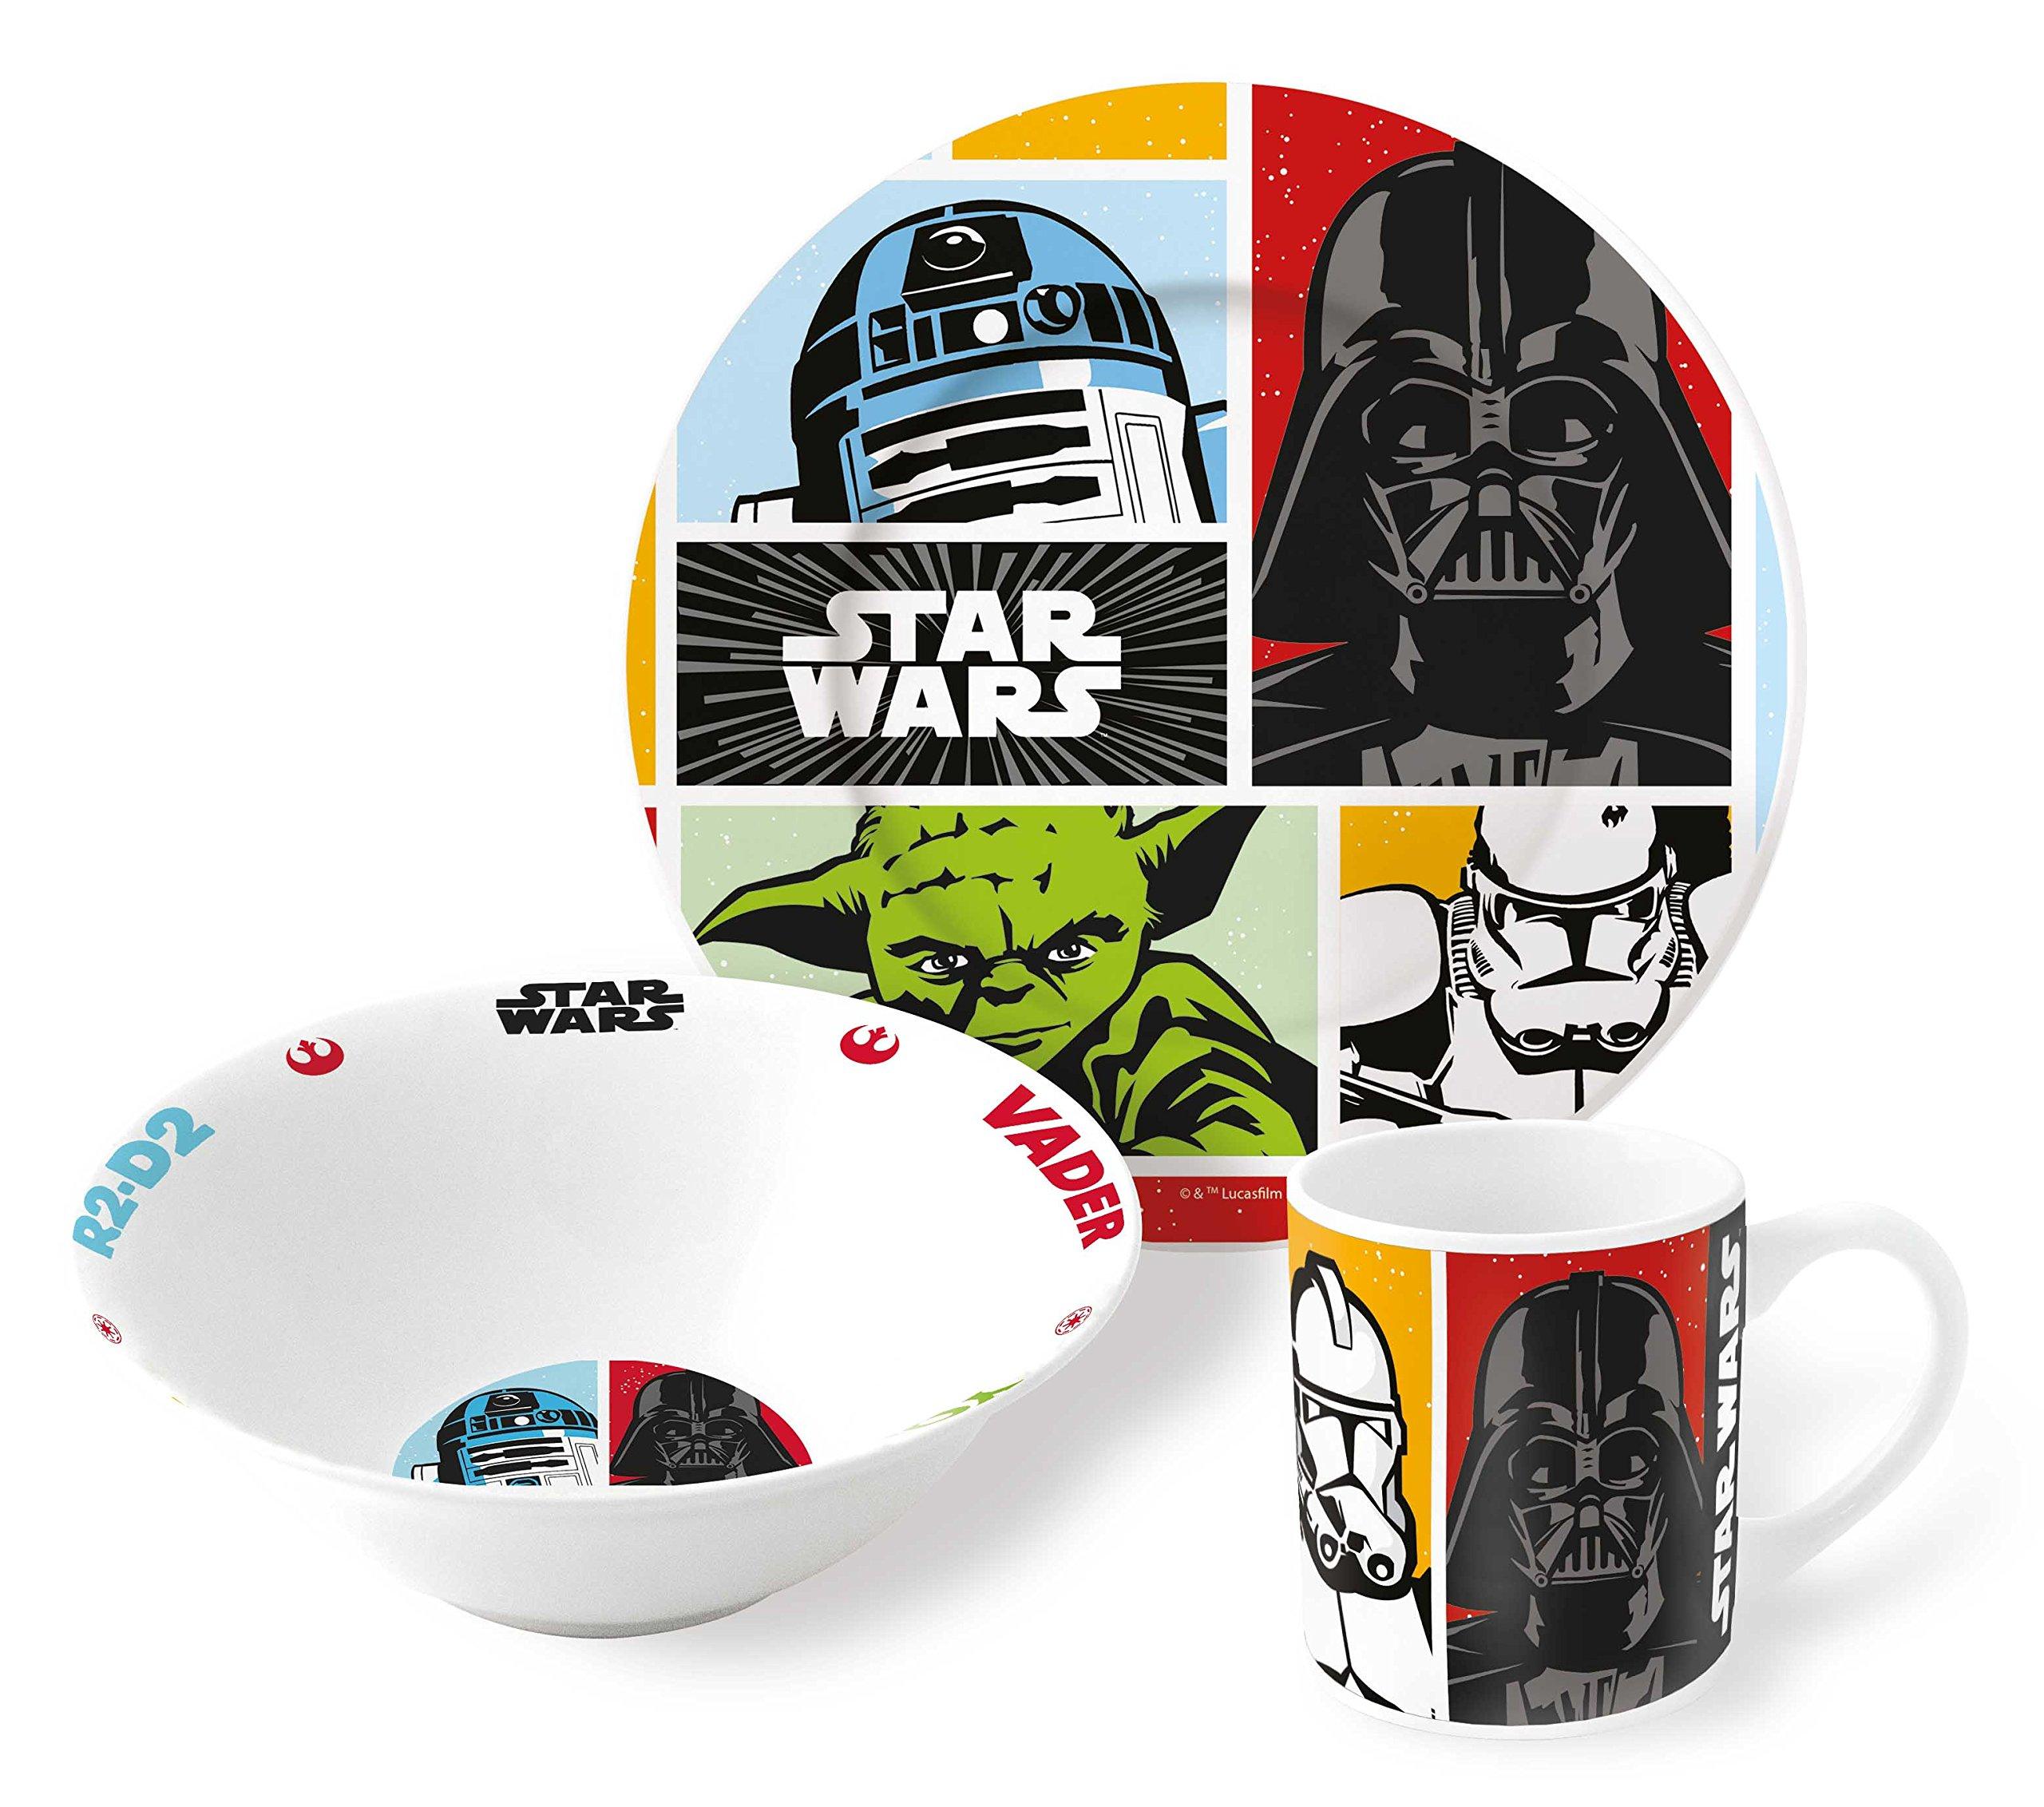 Star Wars Planetoys – Estuche Regalo Set merienda Ceramica